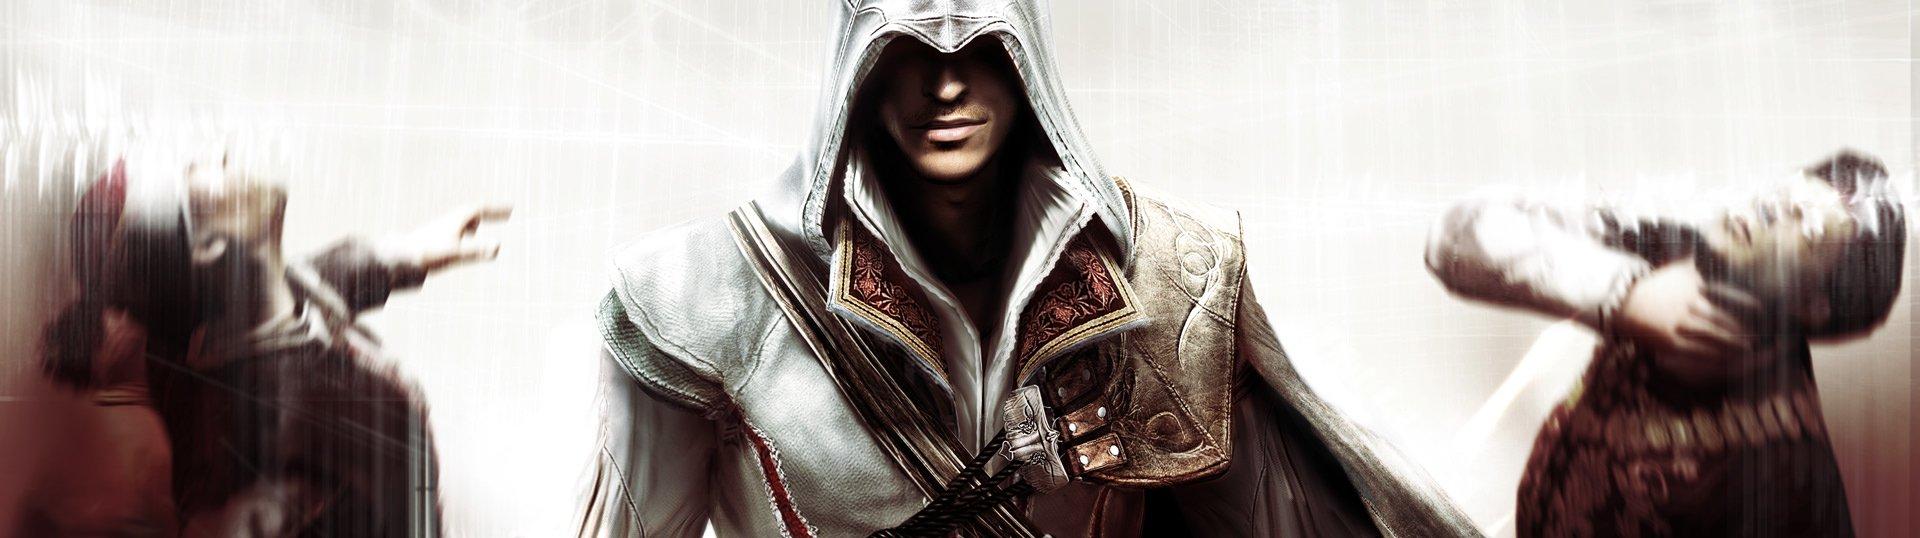 Assassin's Creed II Miễn Phí